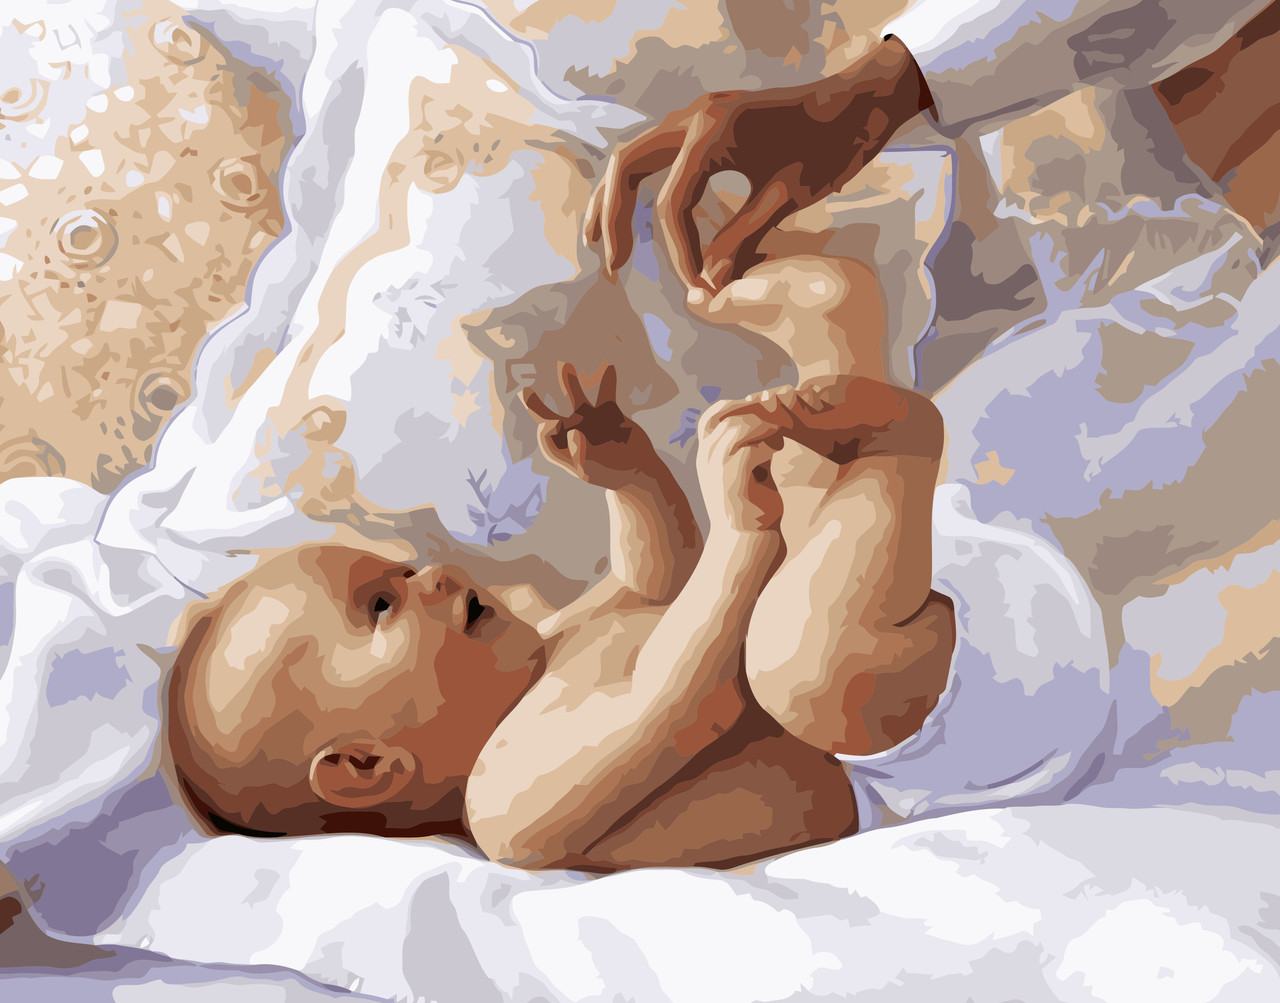 Картина по номерам VA-0928 Младенец 40х50см Strateg